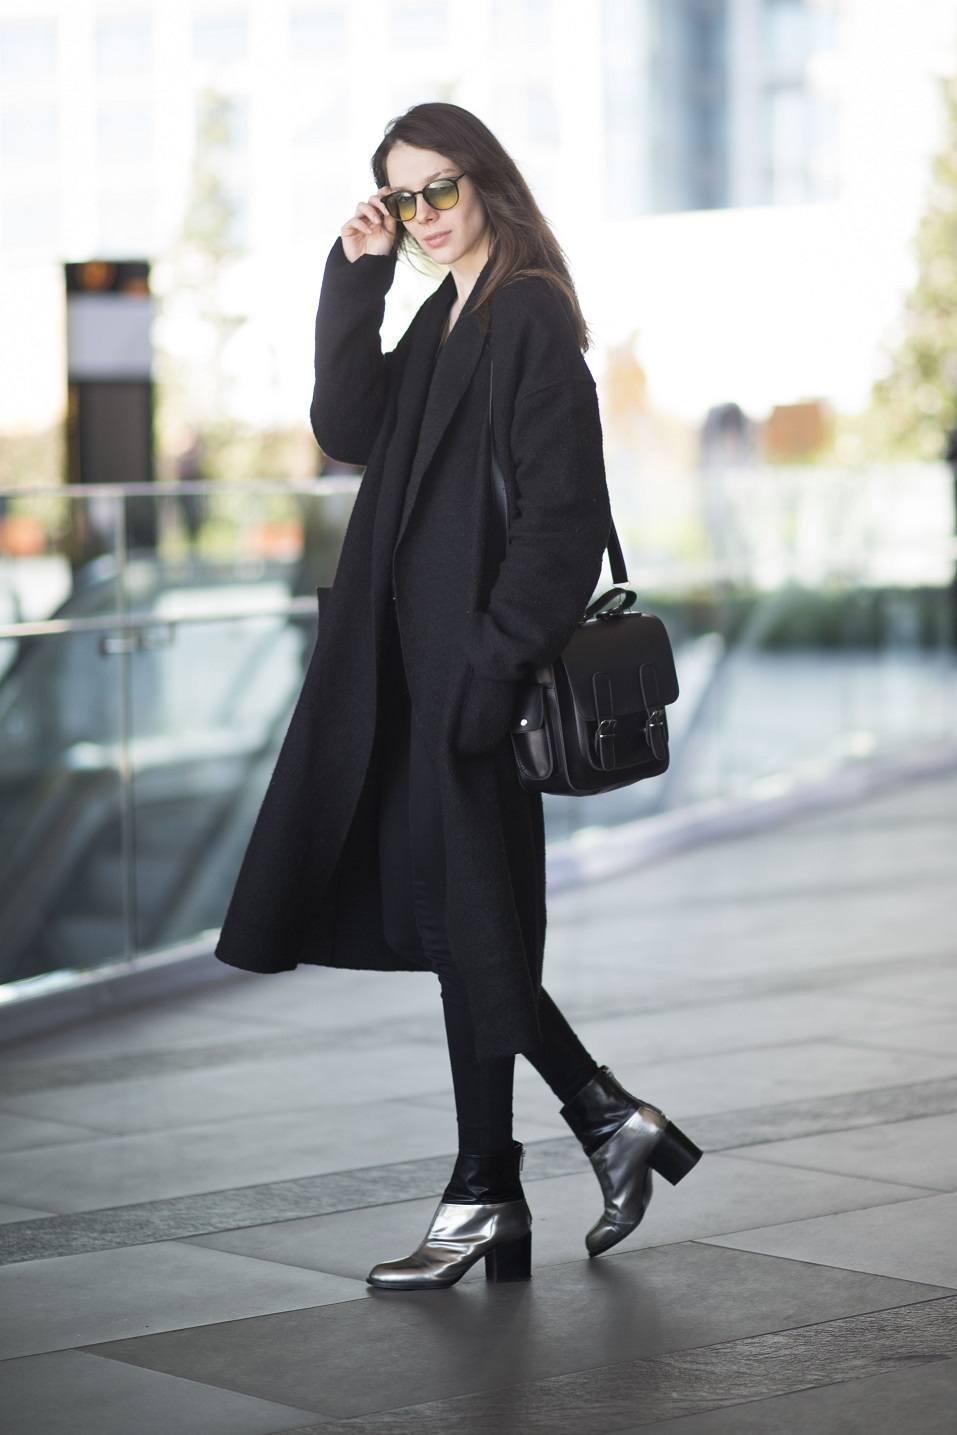 Doga Bursali during the Mercedes-Benz Fashion Week